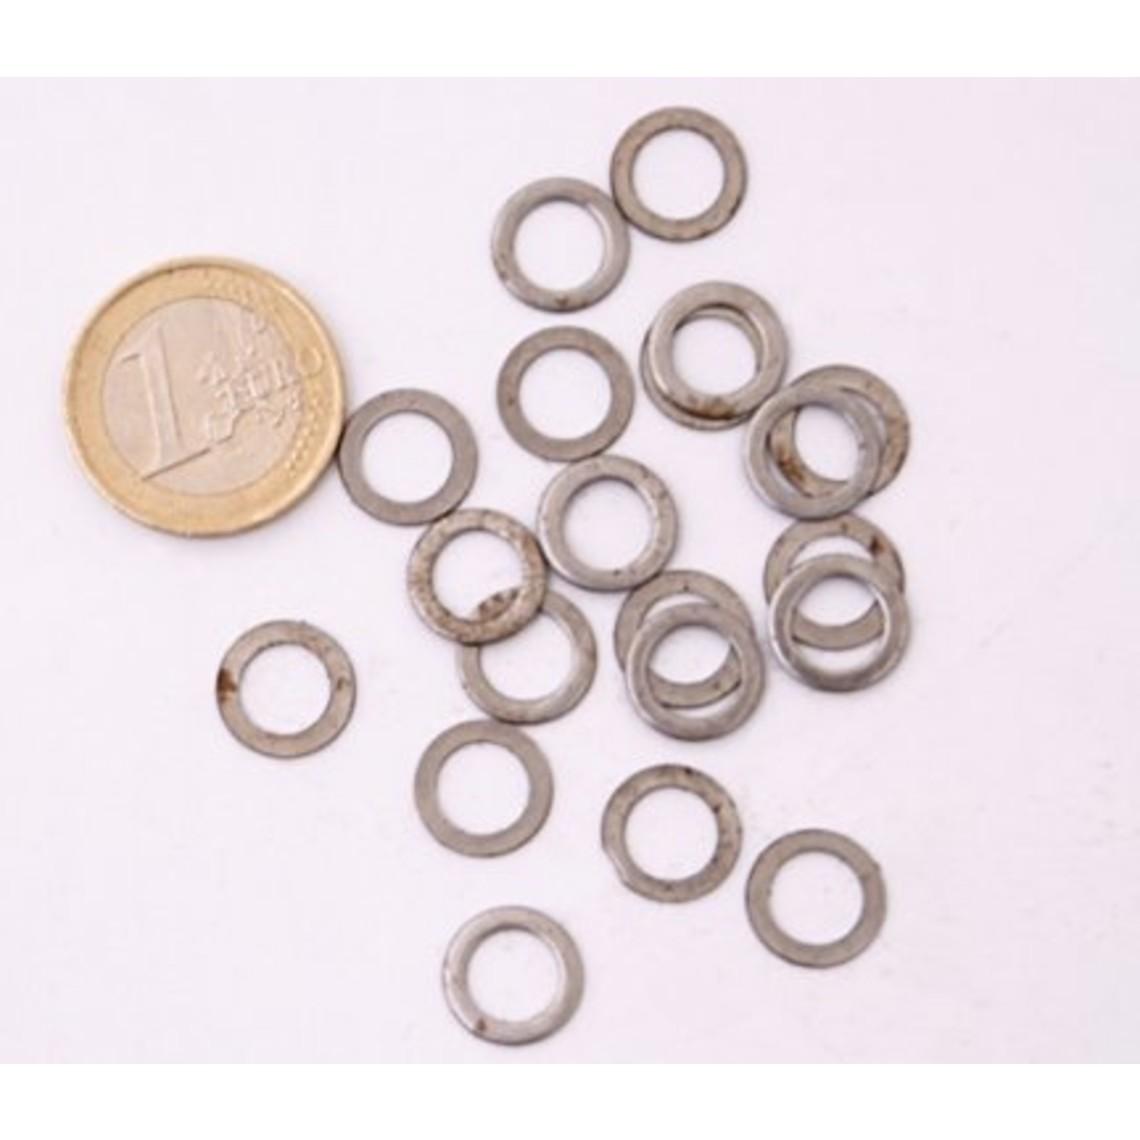 Ulfberth 1 kg anillos sin remache, 8 mm